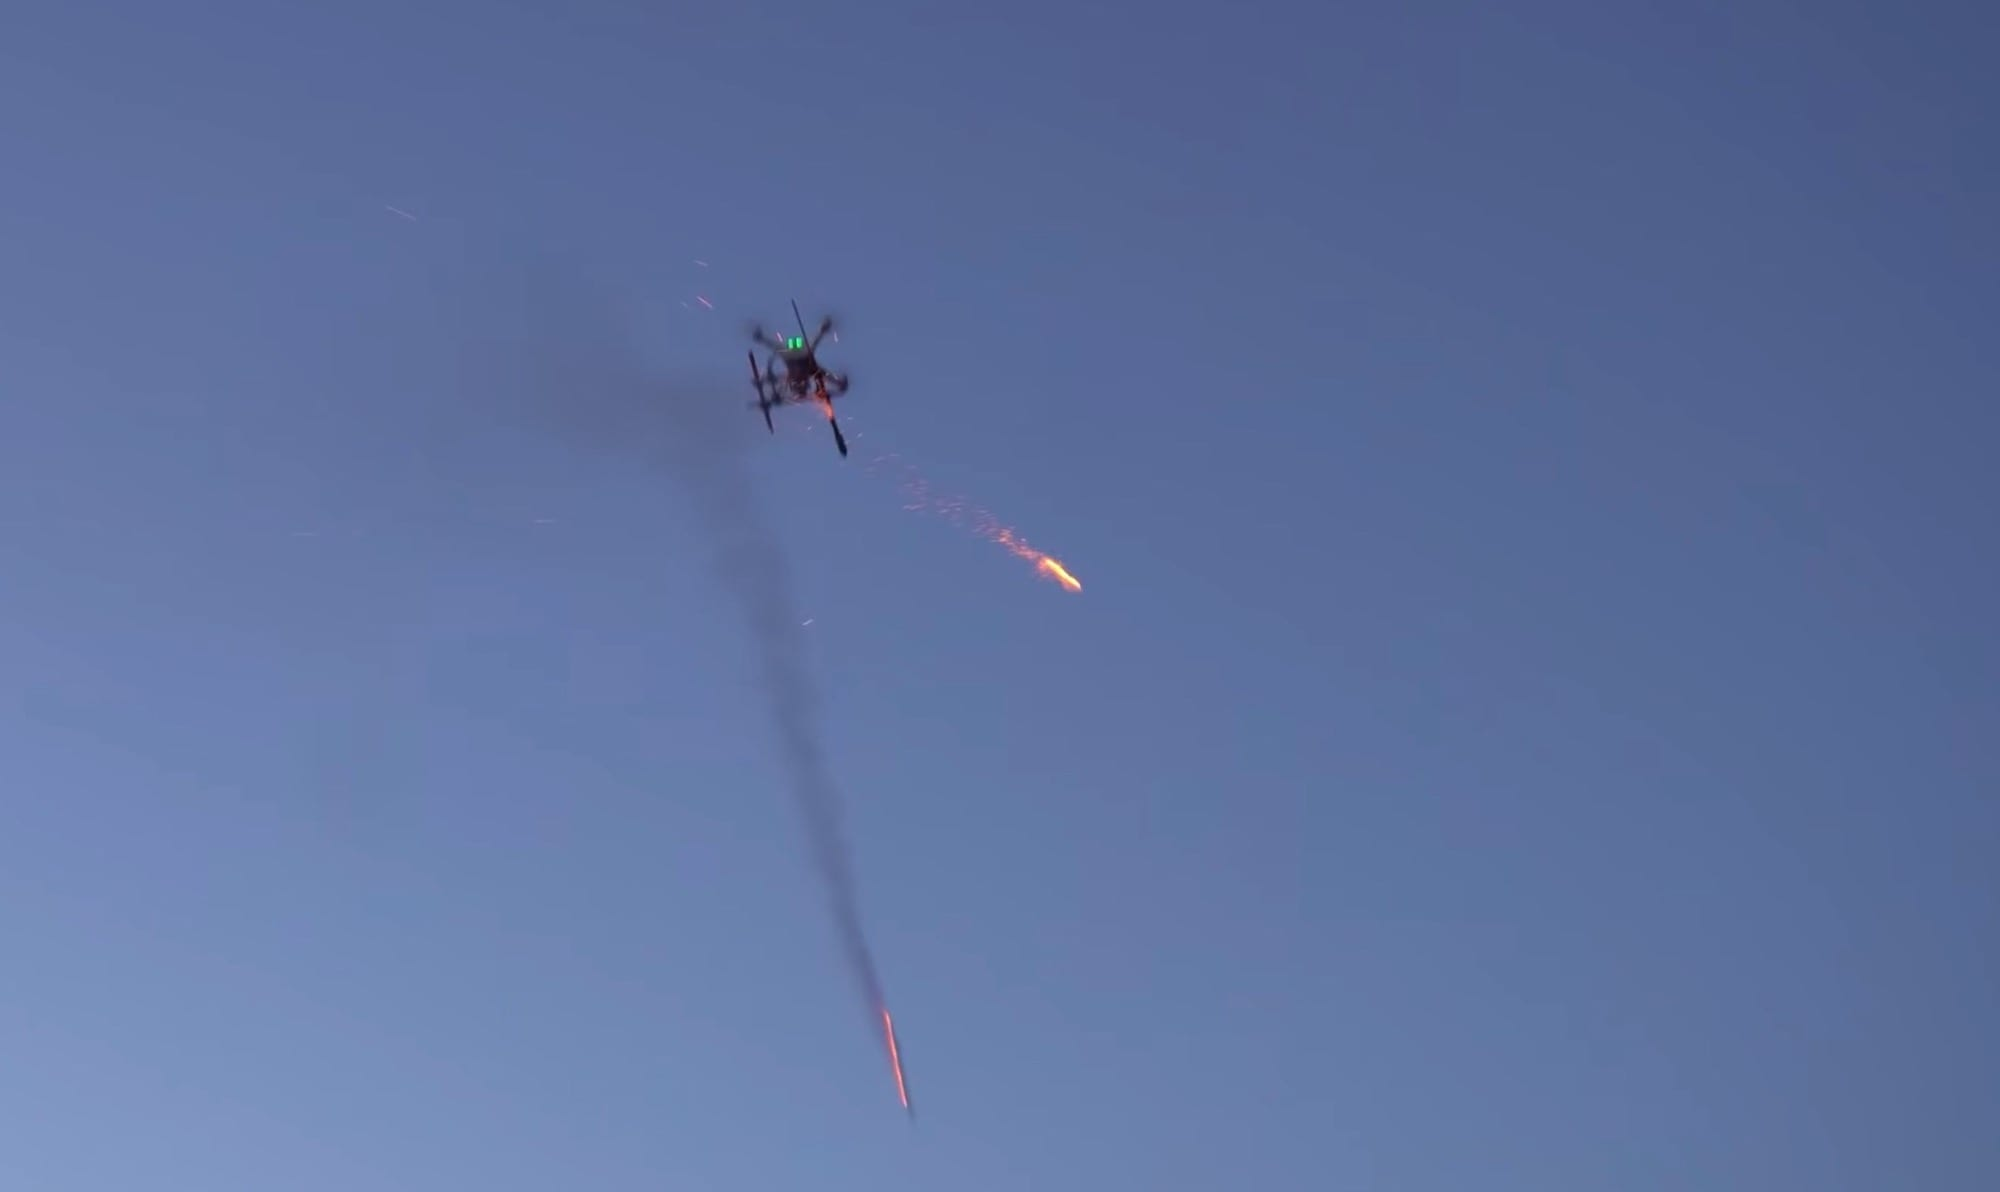 Shooting fireworks from a DJI Phantom drone <p data-wpview-marker=